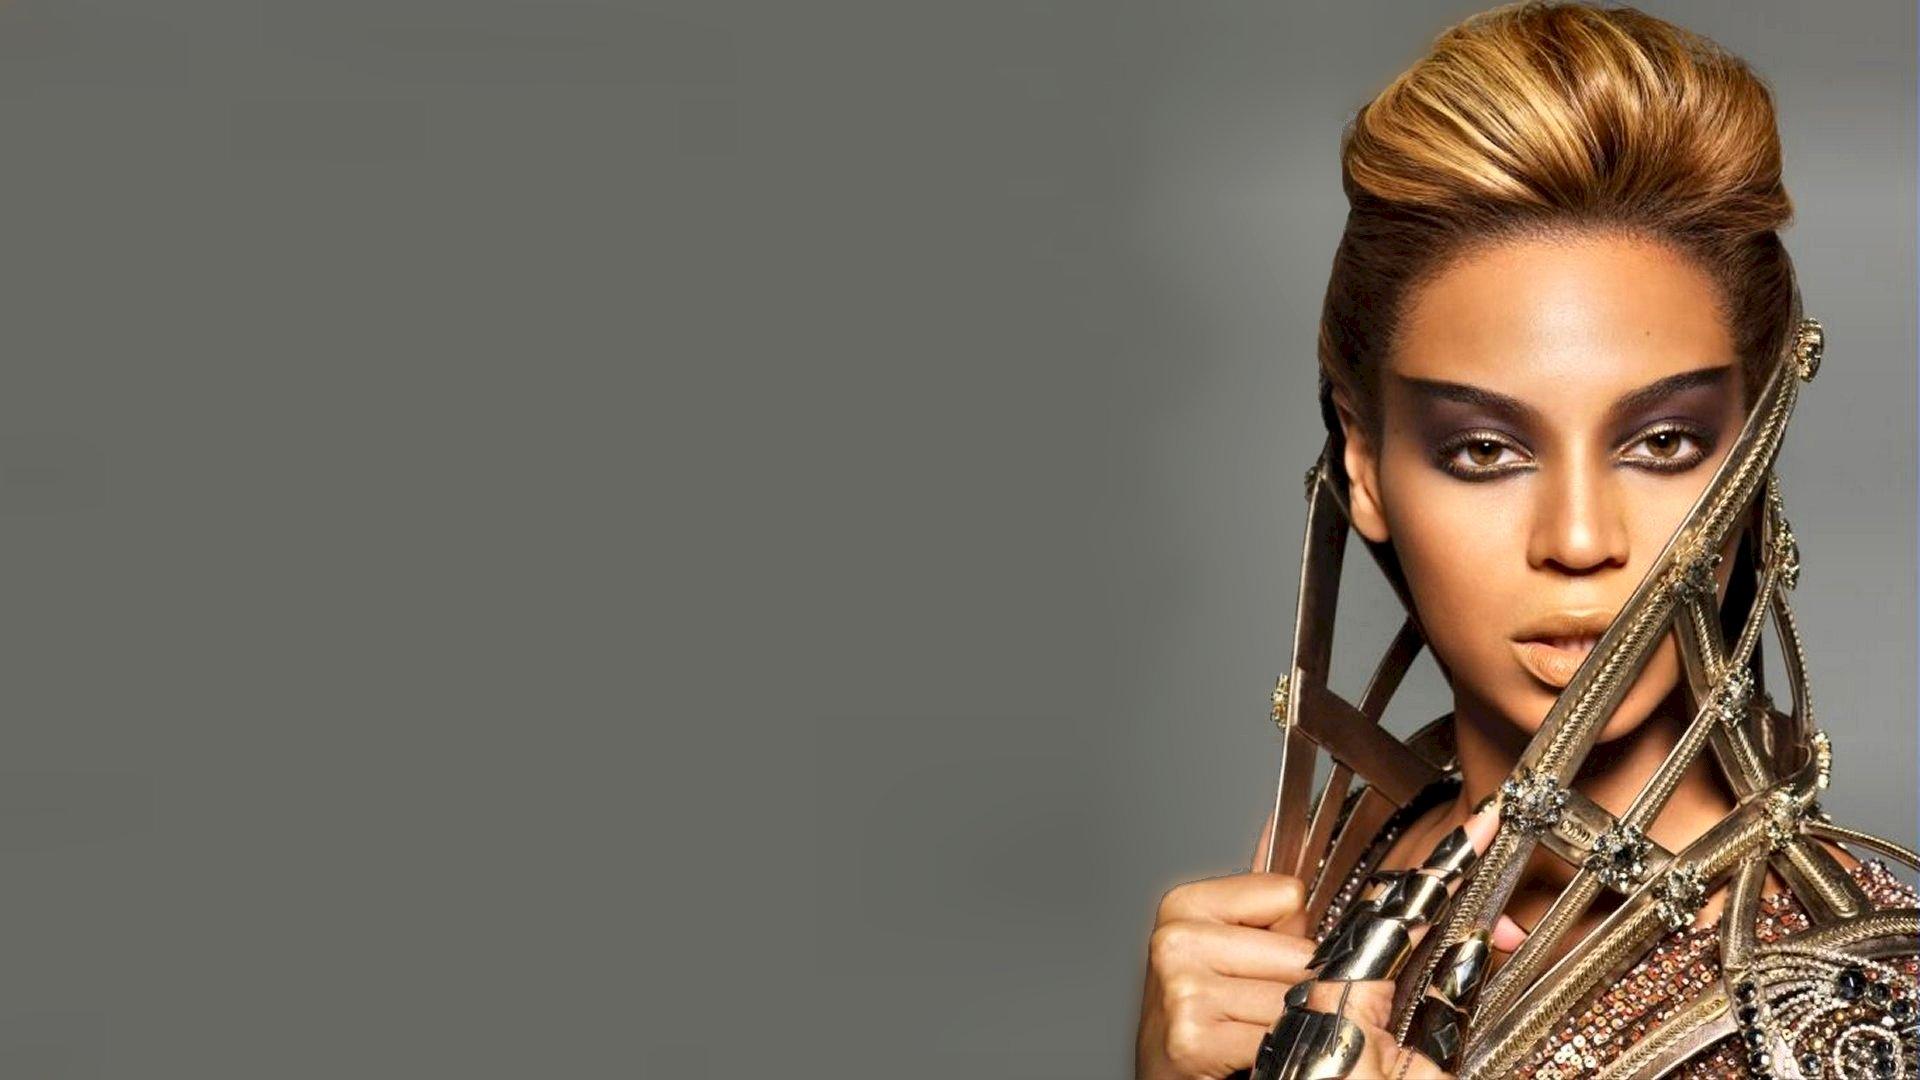 Beyonce Wallpaper; Beyonce Wallpaper; Beyonce Wallpaper ...